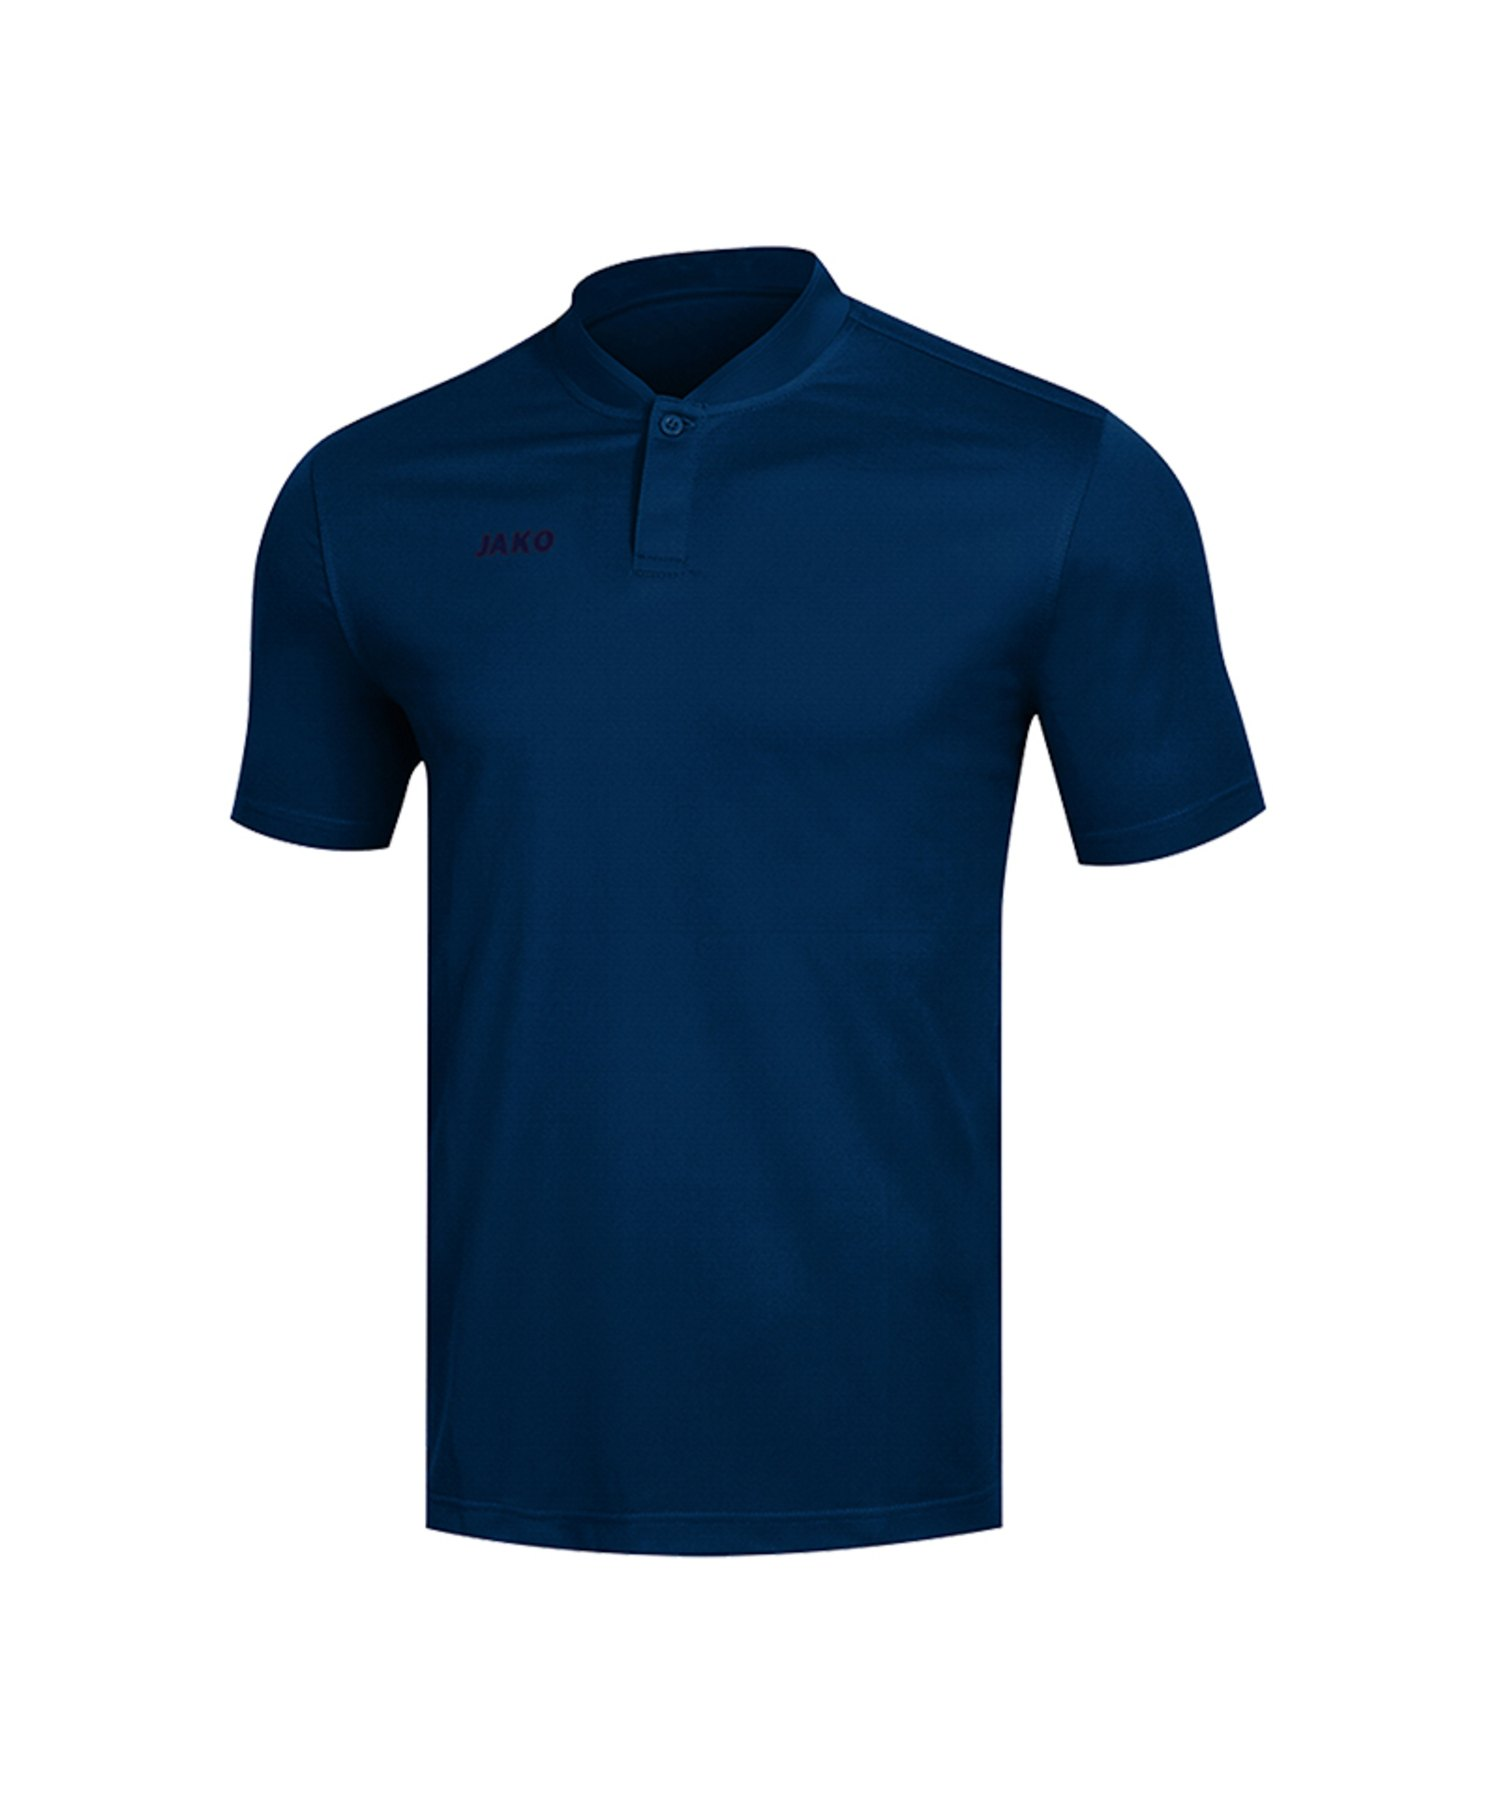 Jako Prestige Poloshirt Damen Blau F49 - Blau